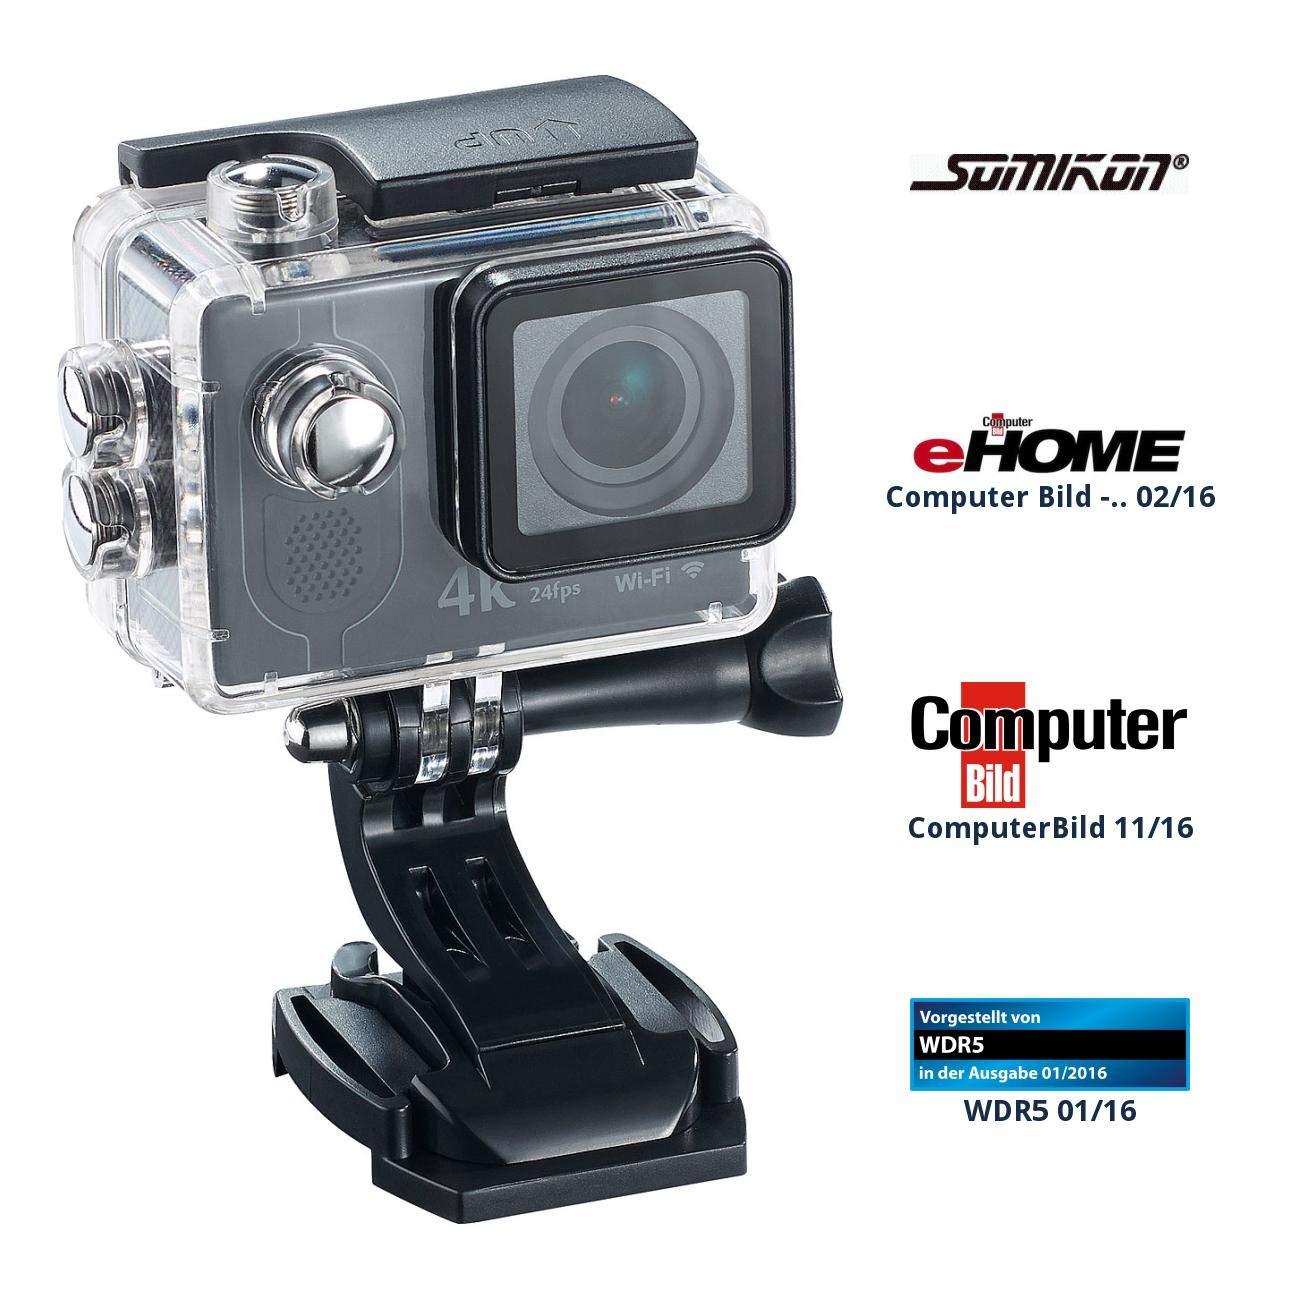 Somikon Action Kamera 4K: 4K-Action-Cam mit UHD-Video bei 24 fps, 16-MP-Sony-Sensor, IP68, WLAN (Fahrrad Kamera)